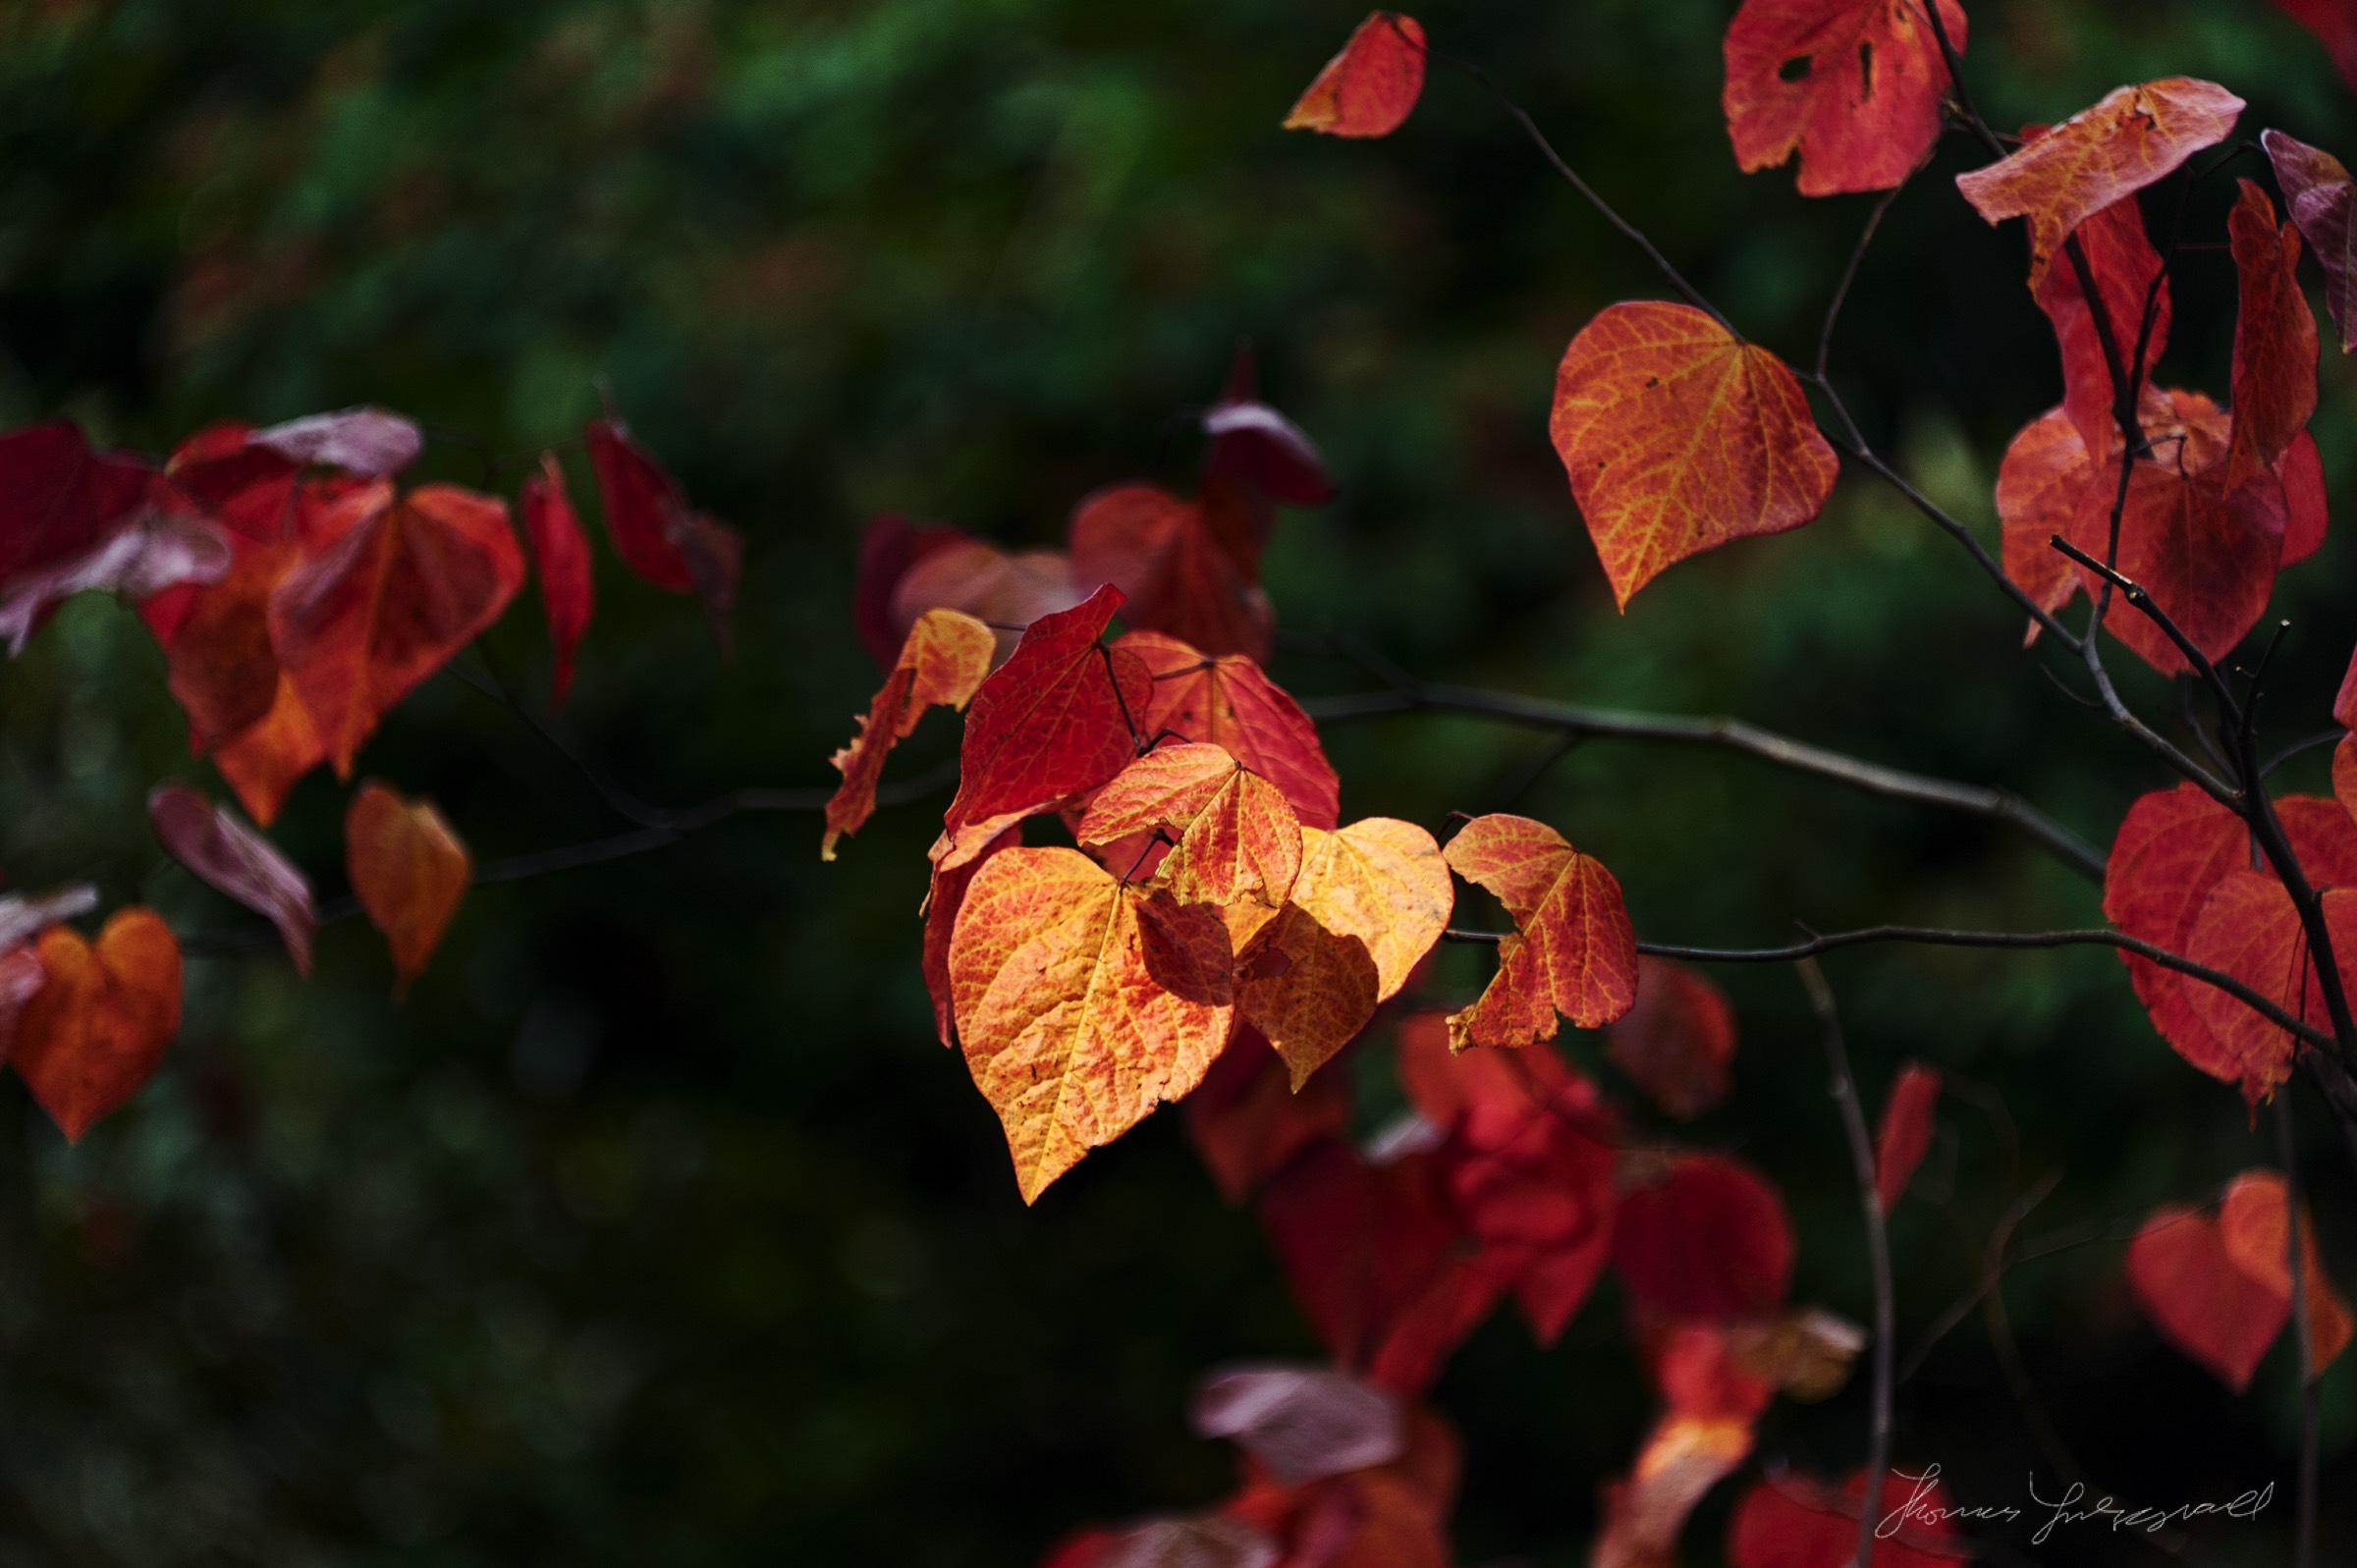 Autumn-Colours-2017-11.jpg